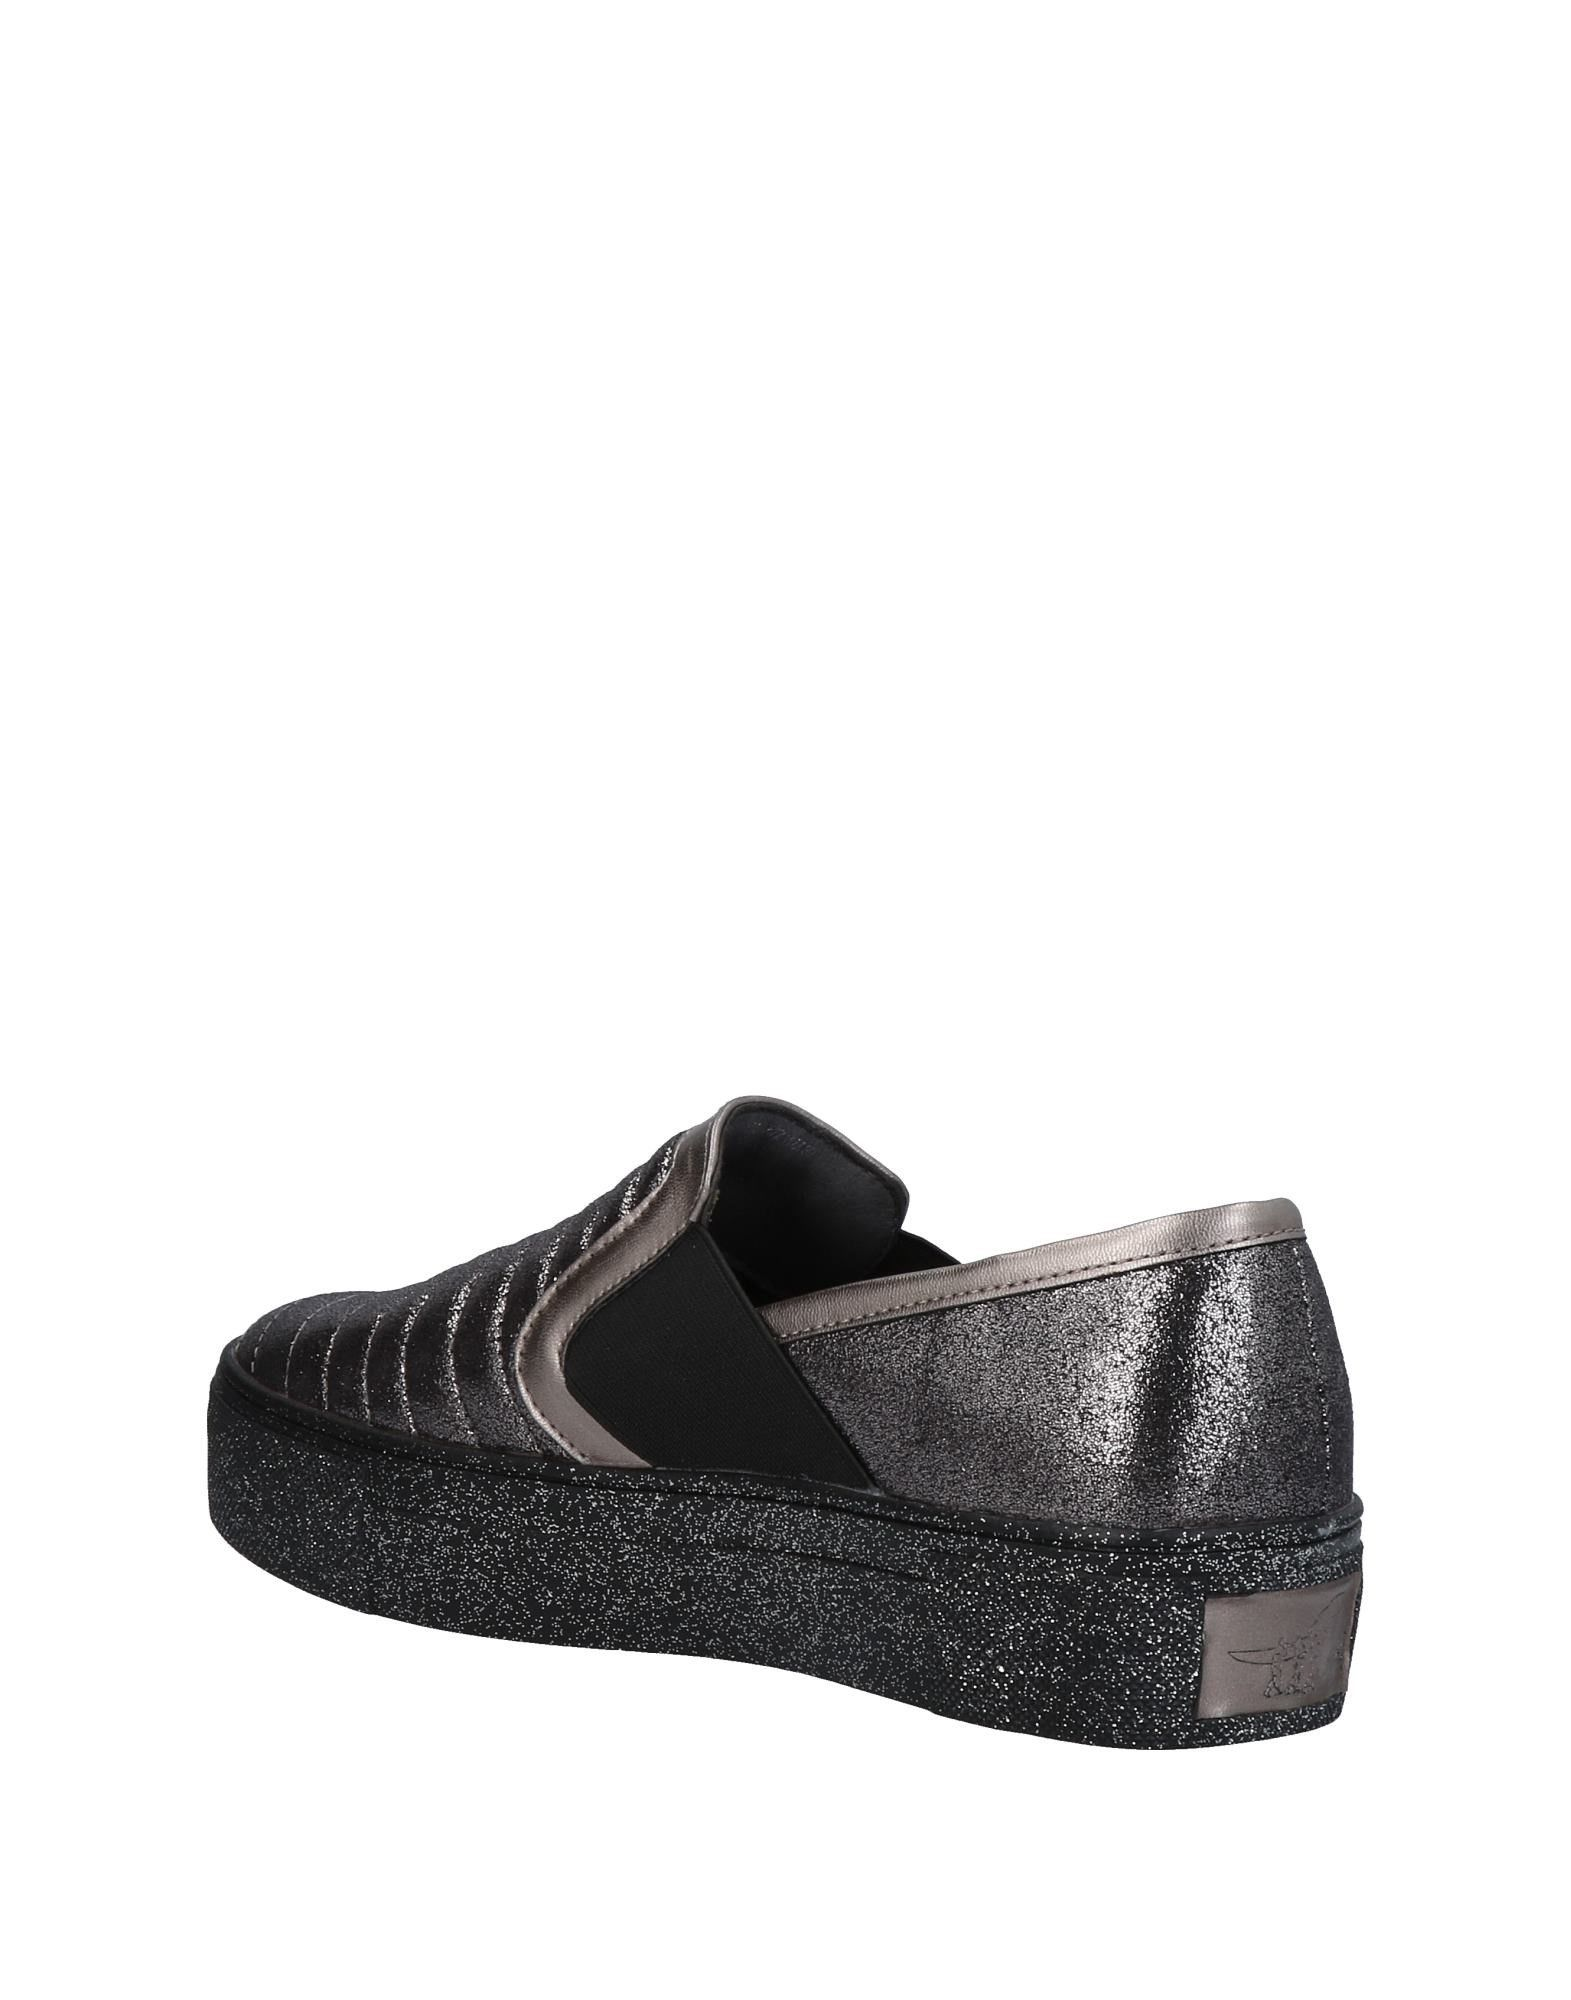 Henry Cotton's Sneakers Damen Damen Sneakers  11454196TB 5922bb